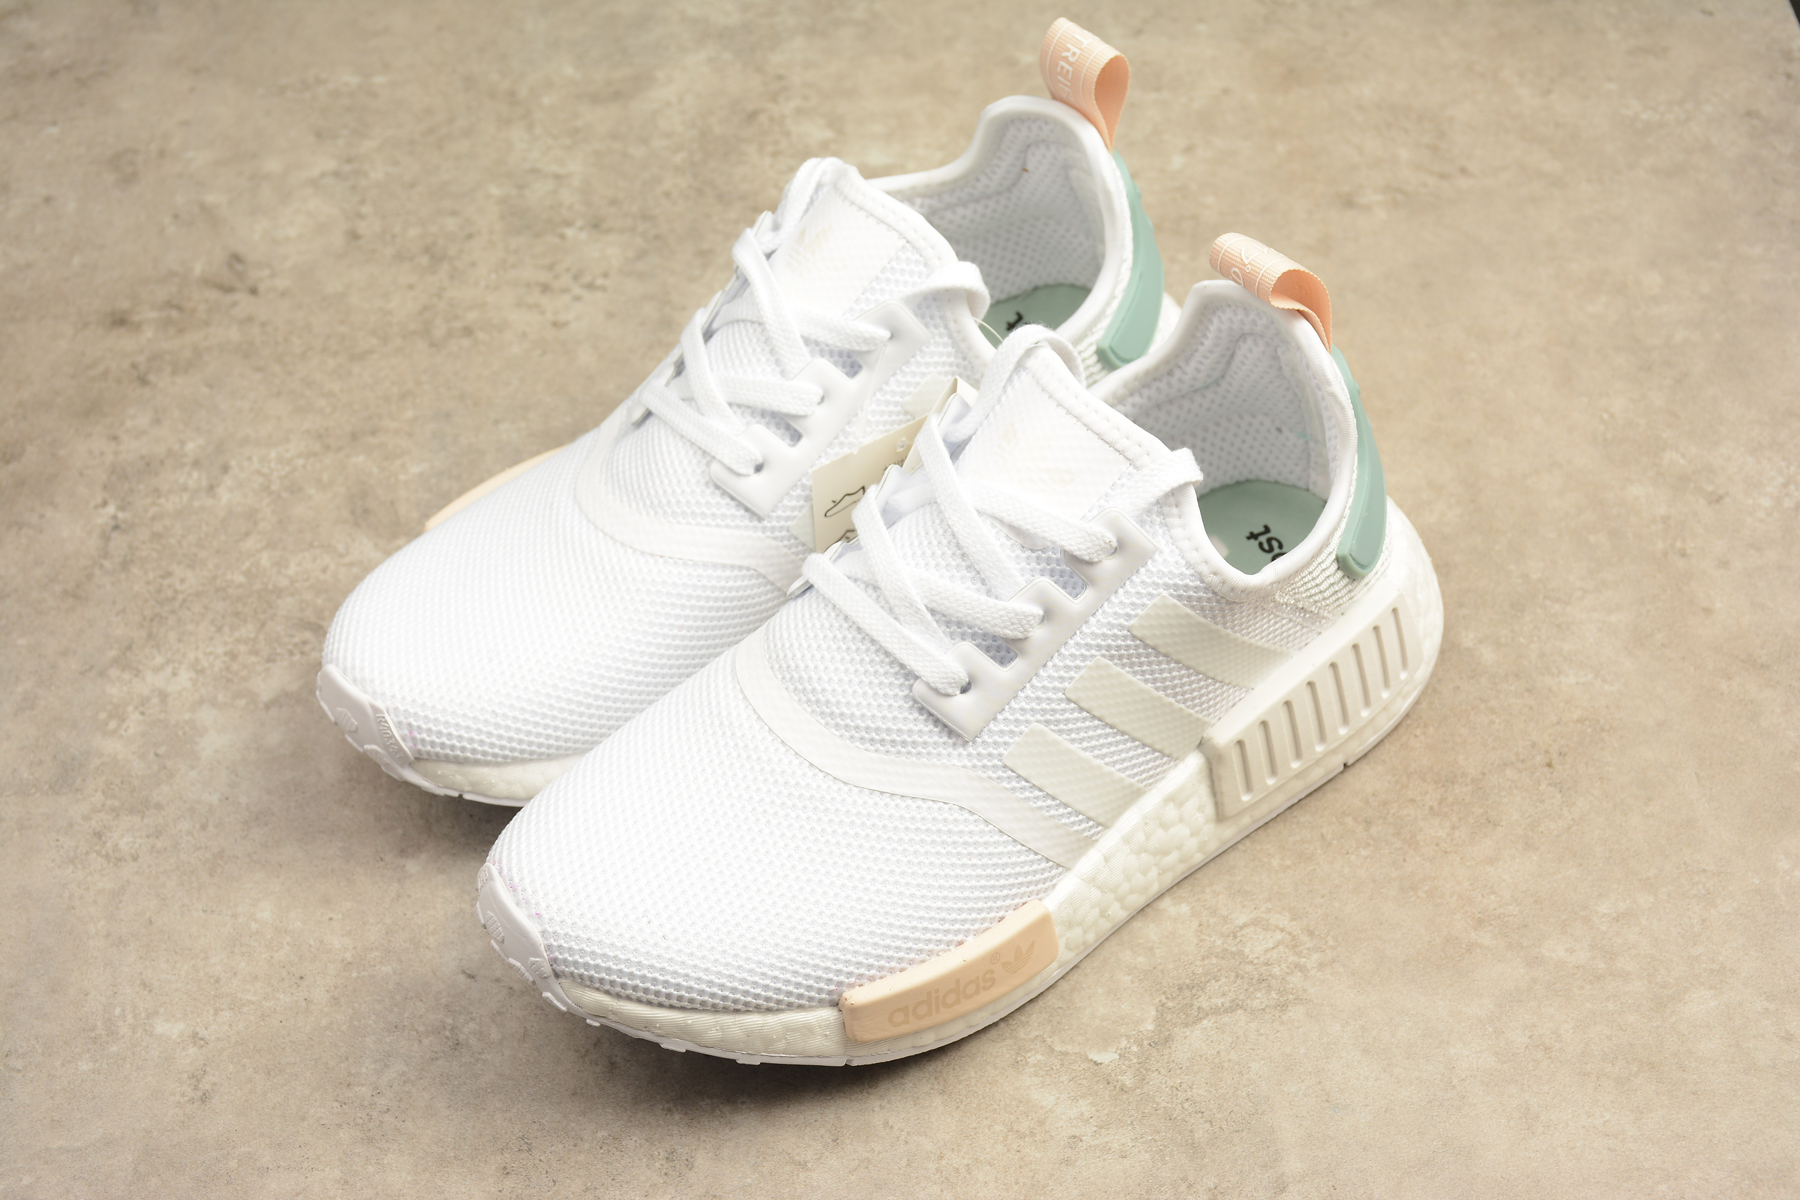 3fb8864da7c5e ... pk eca68 d0d96 shopping adidas nmd r1 boost runner white mint orange  shoes on storenvy 871ba d6bc6 ...